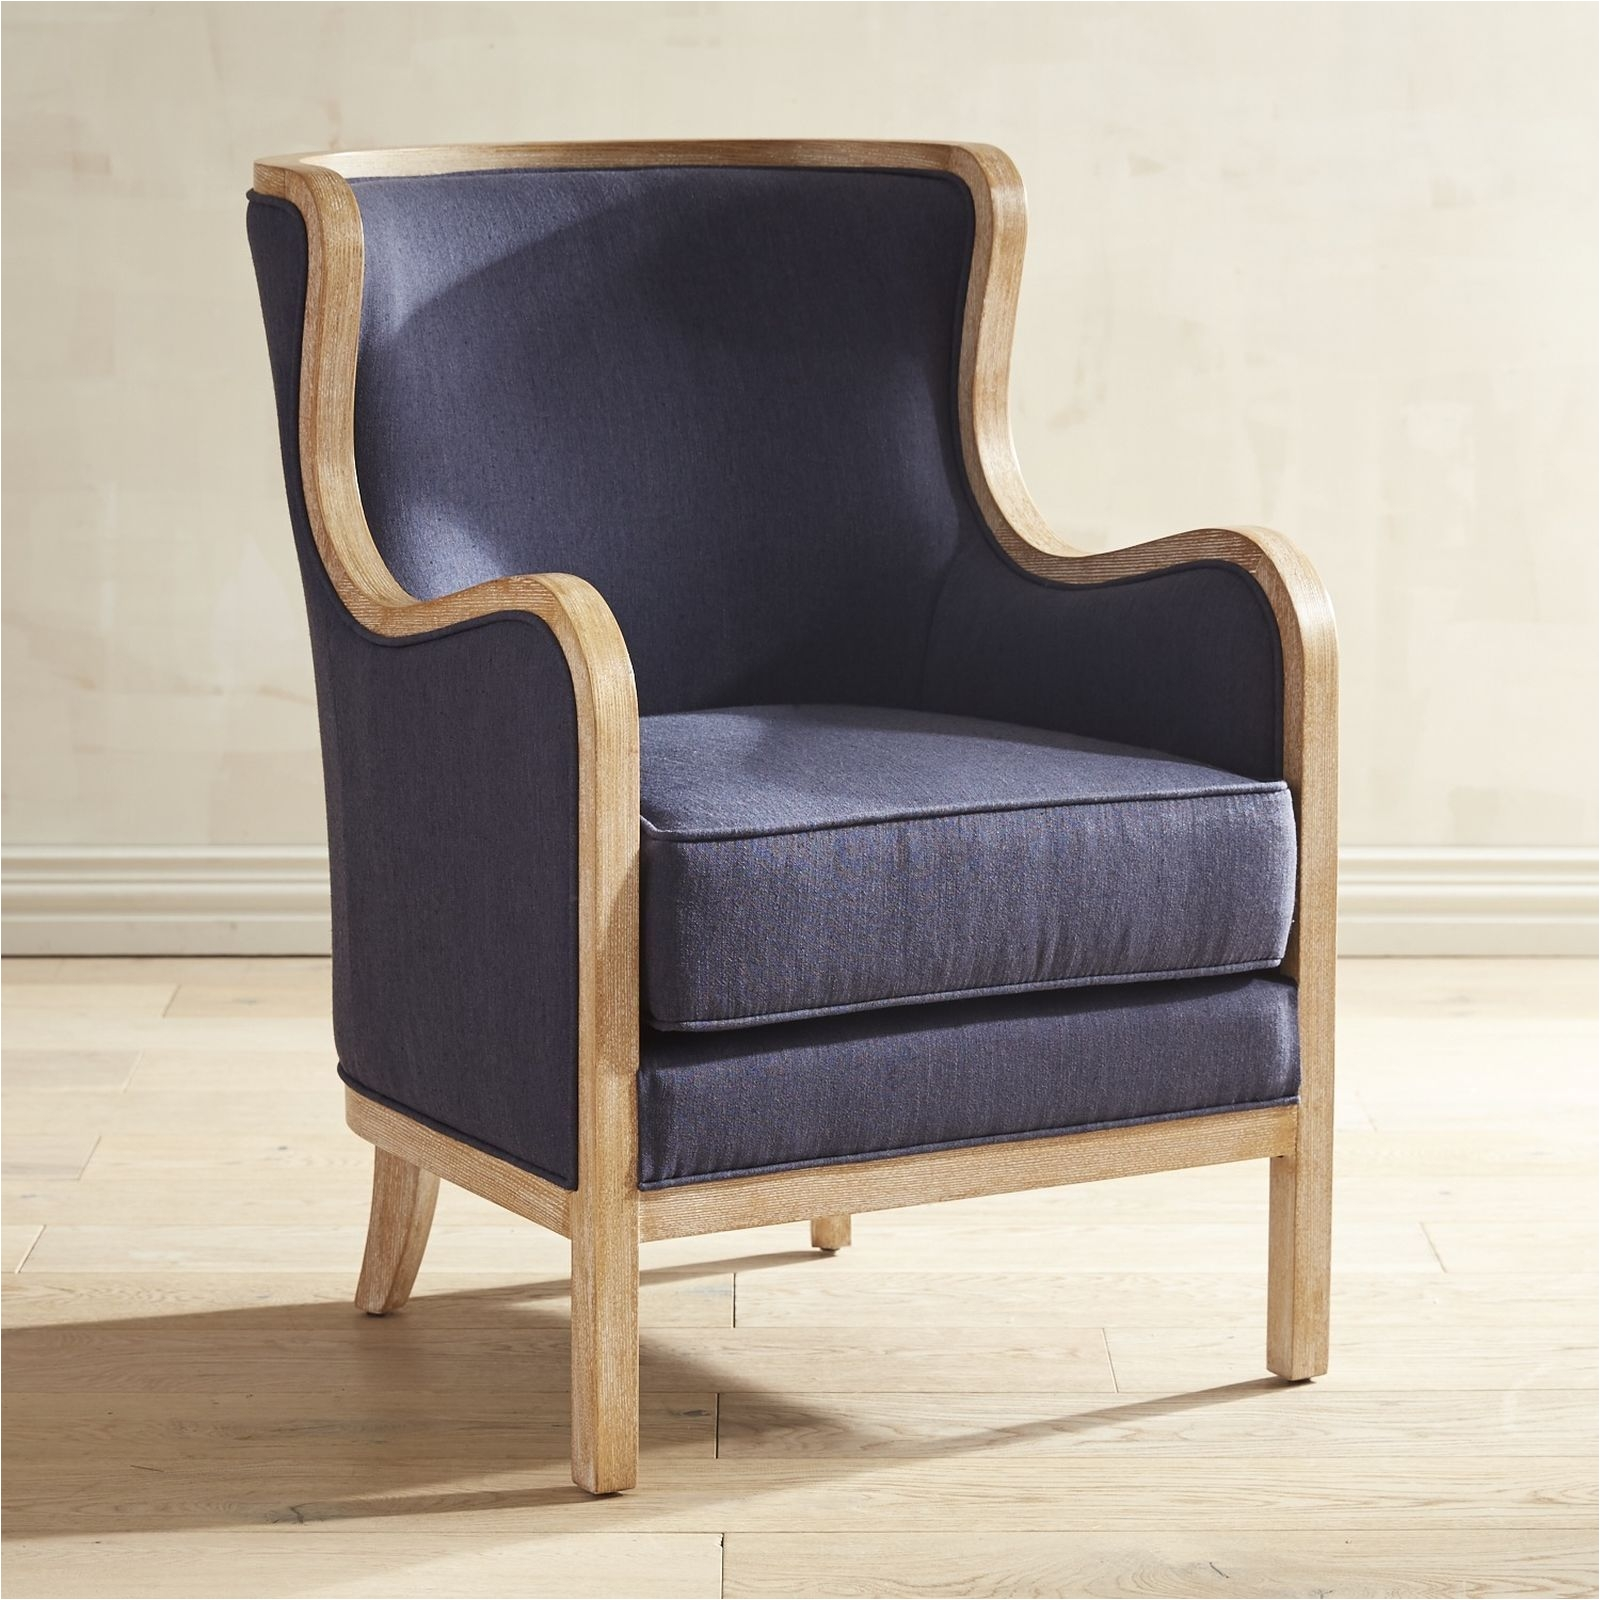 devon indigo blue chair navrhy oba vaca ch pokoja pier 1 imports